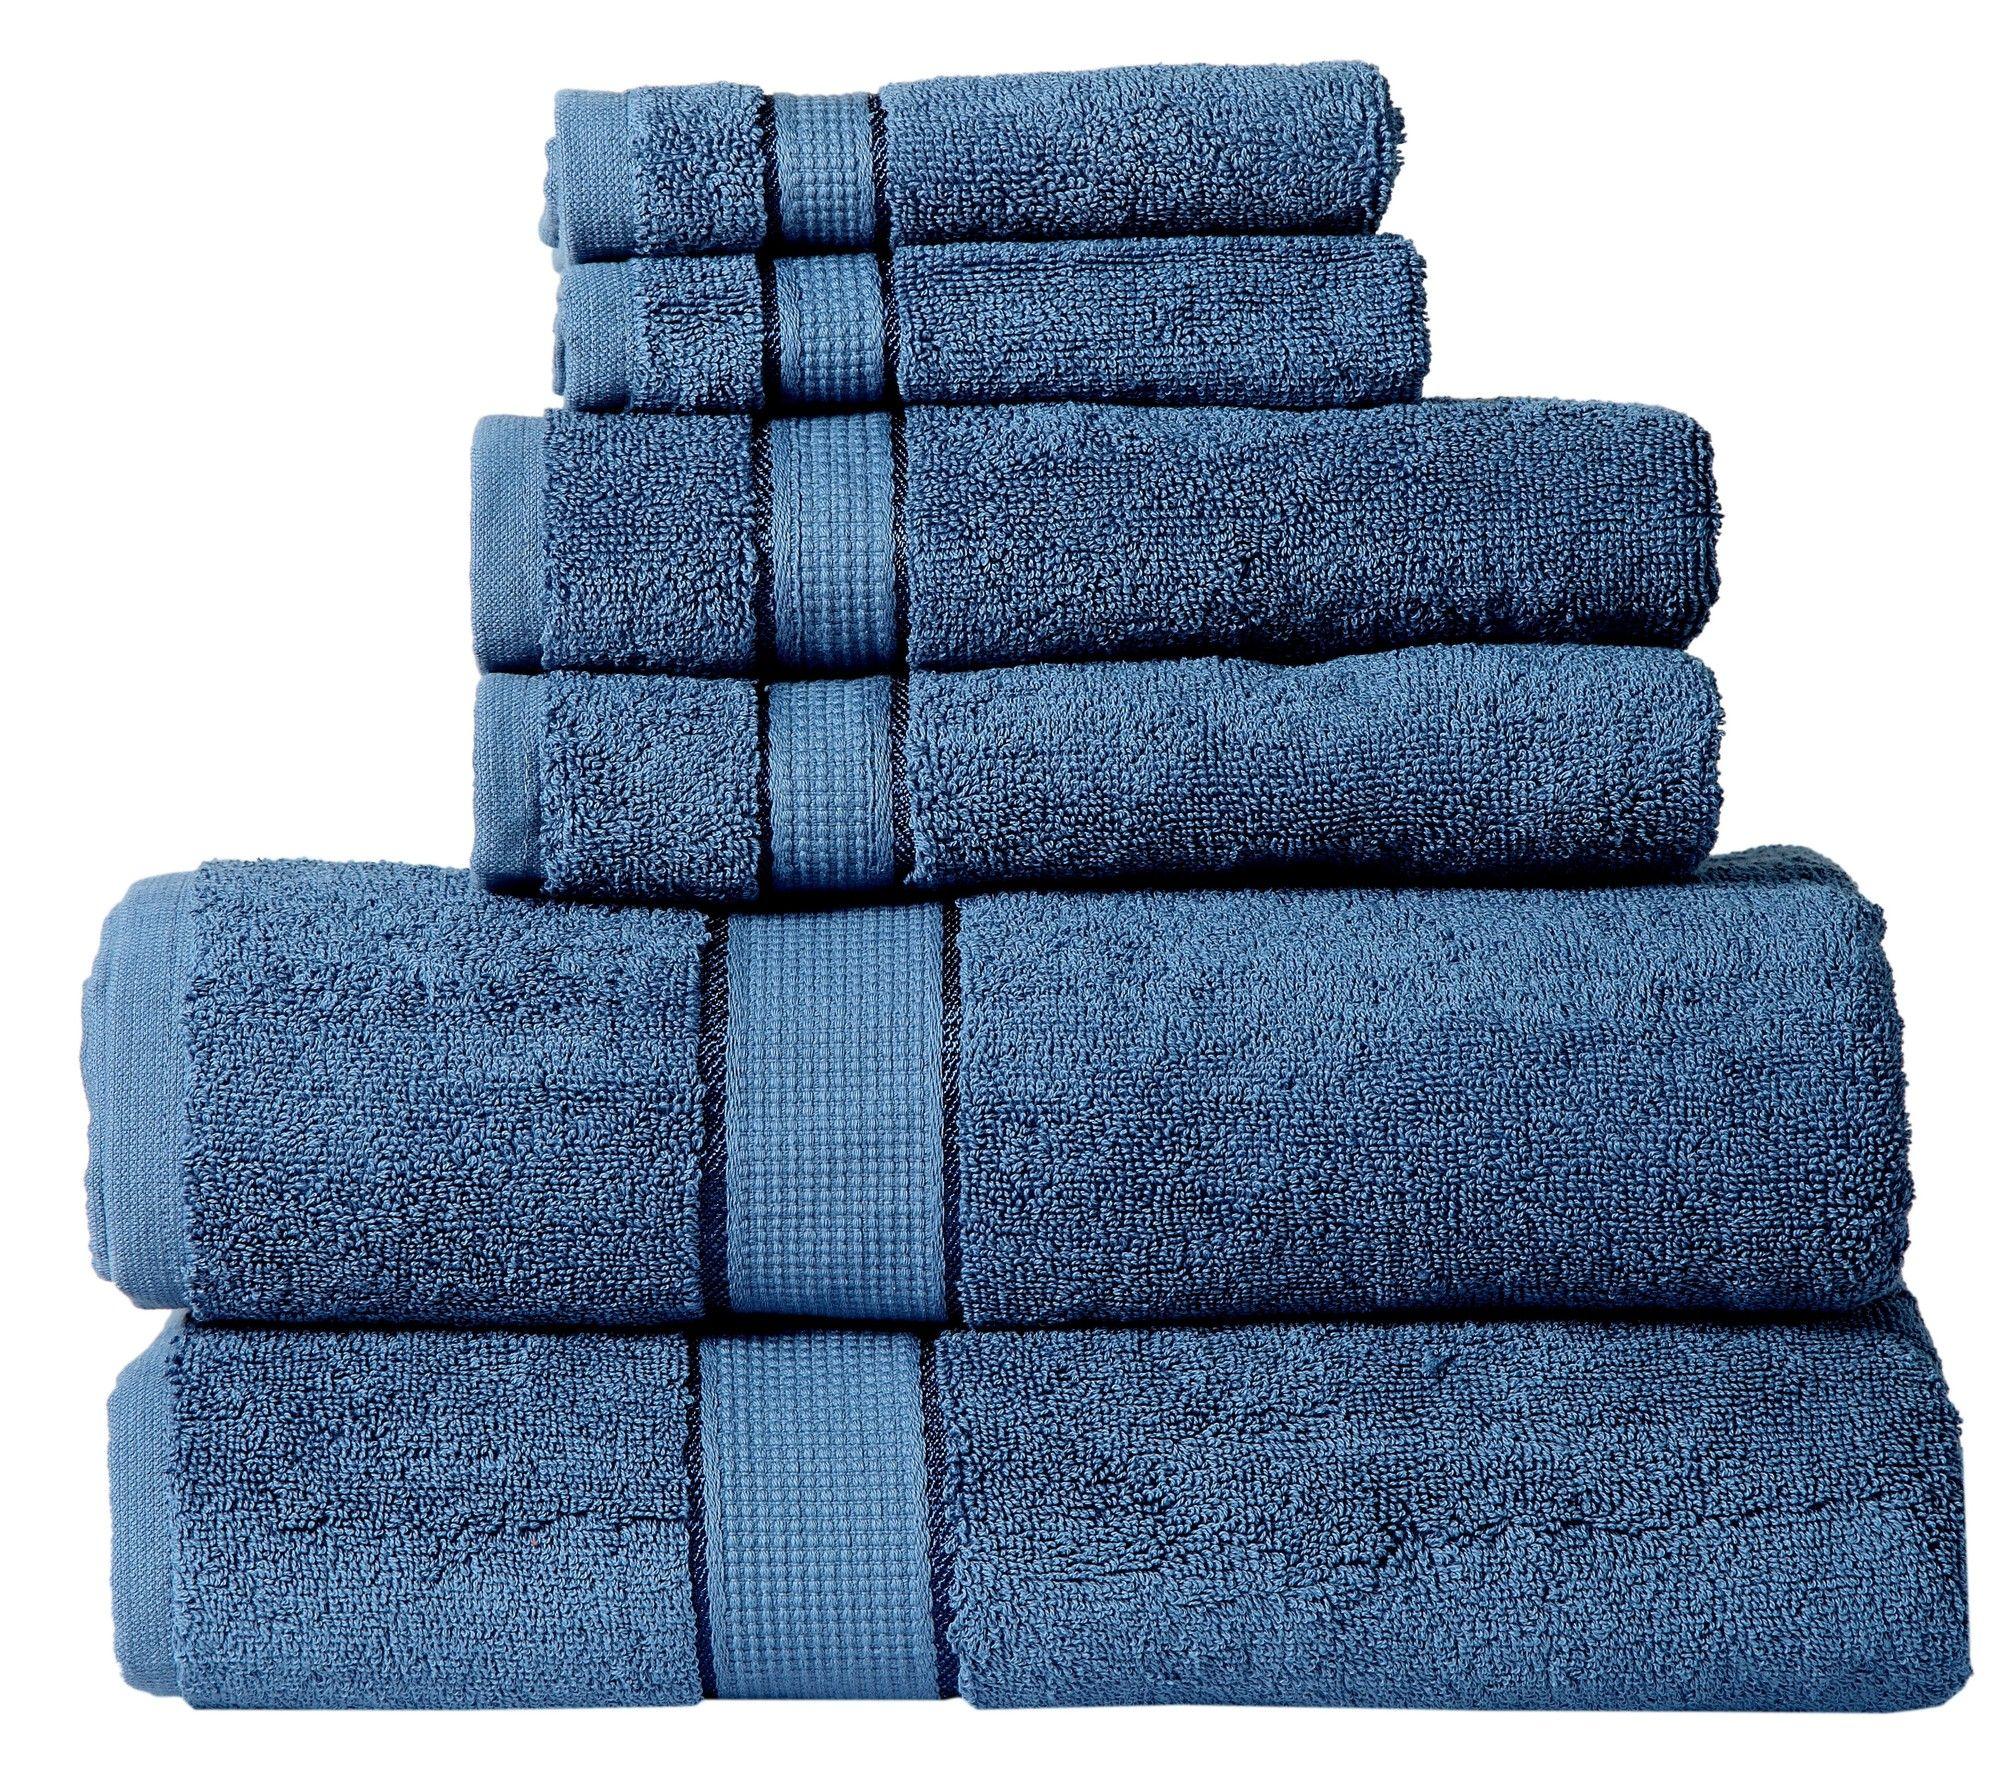 6 Piece Towel Set Towel Set Towel Bath Towels Luxury